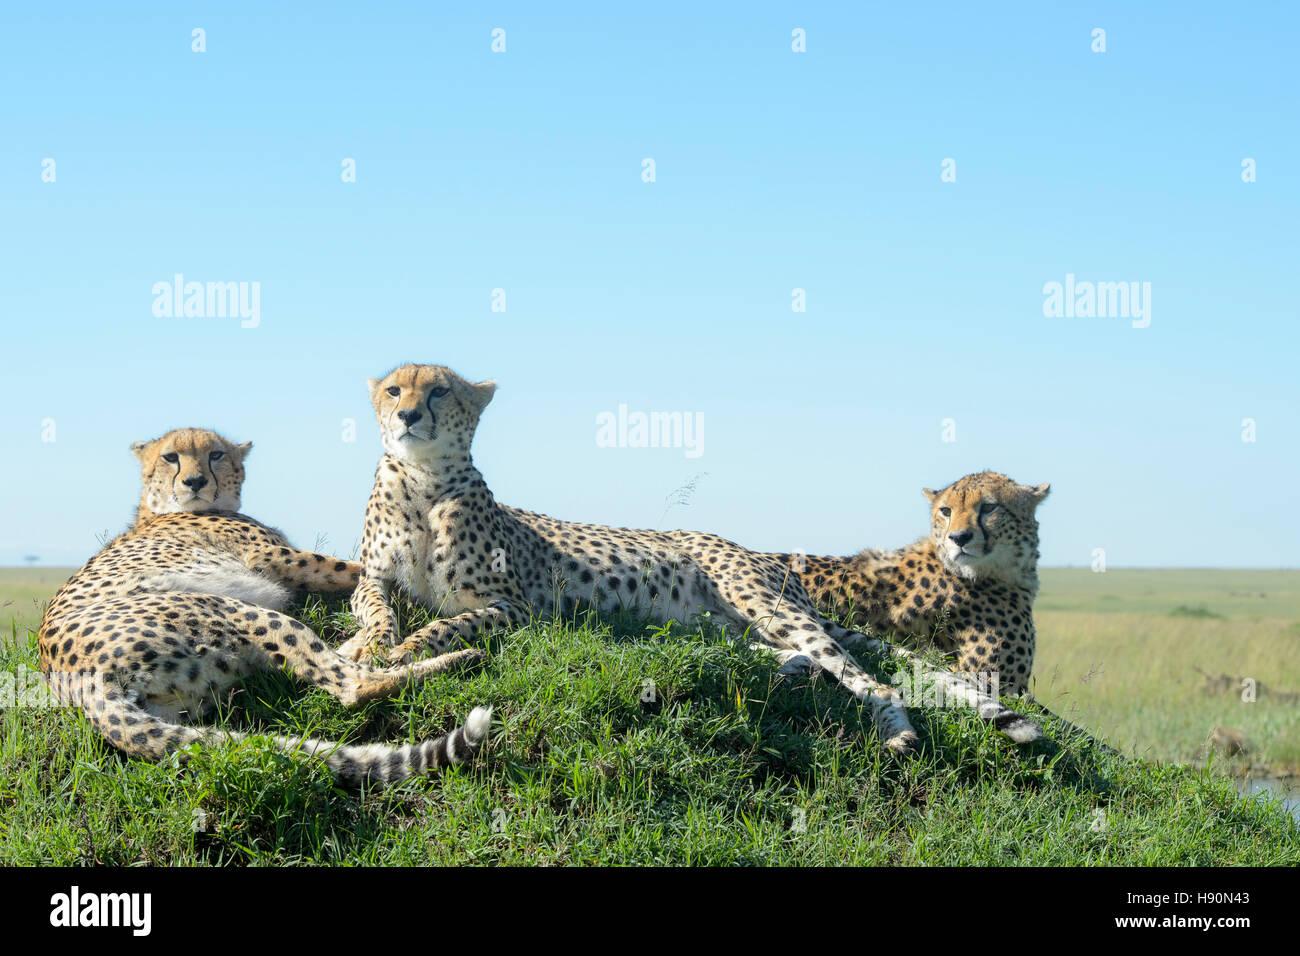 Three Cheetah (Acinonix jubatus) on hill in savanna, close up, Maasai Mara National Reserve, Kenya - Stock Image